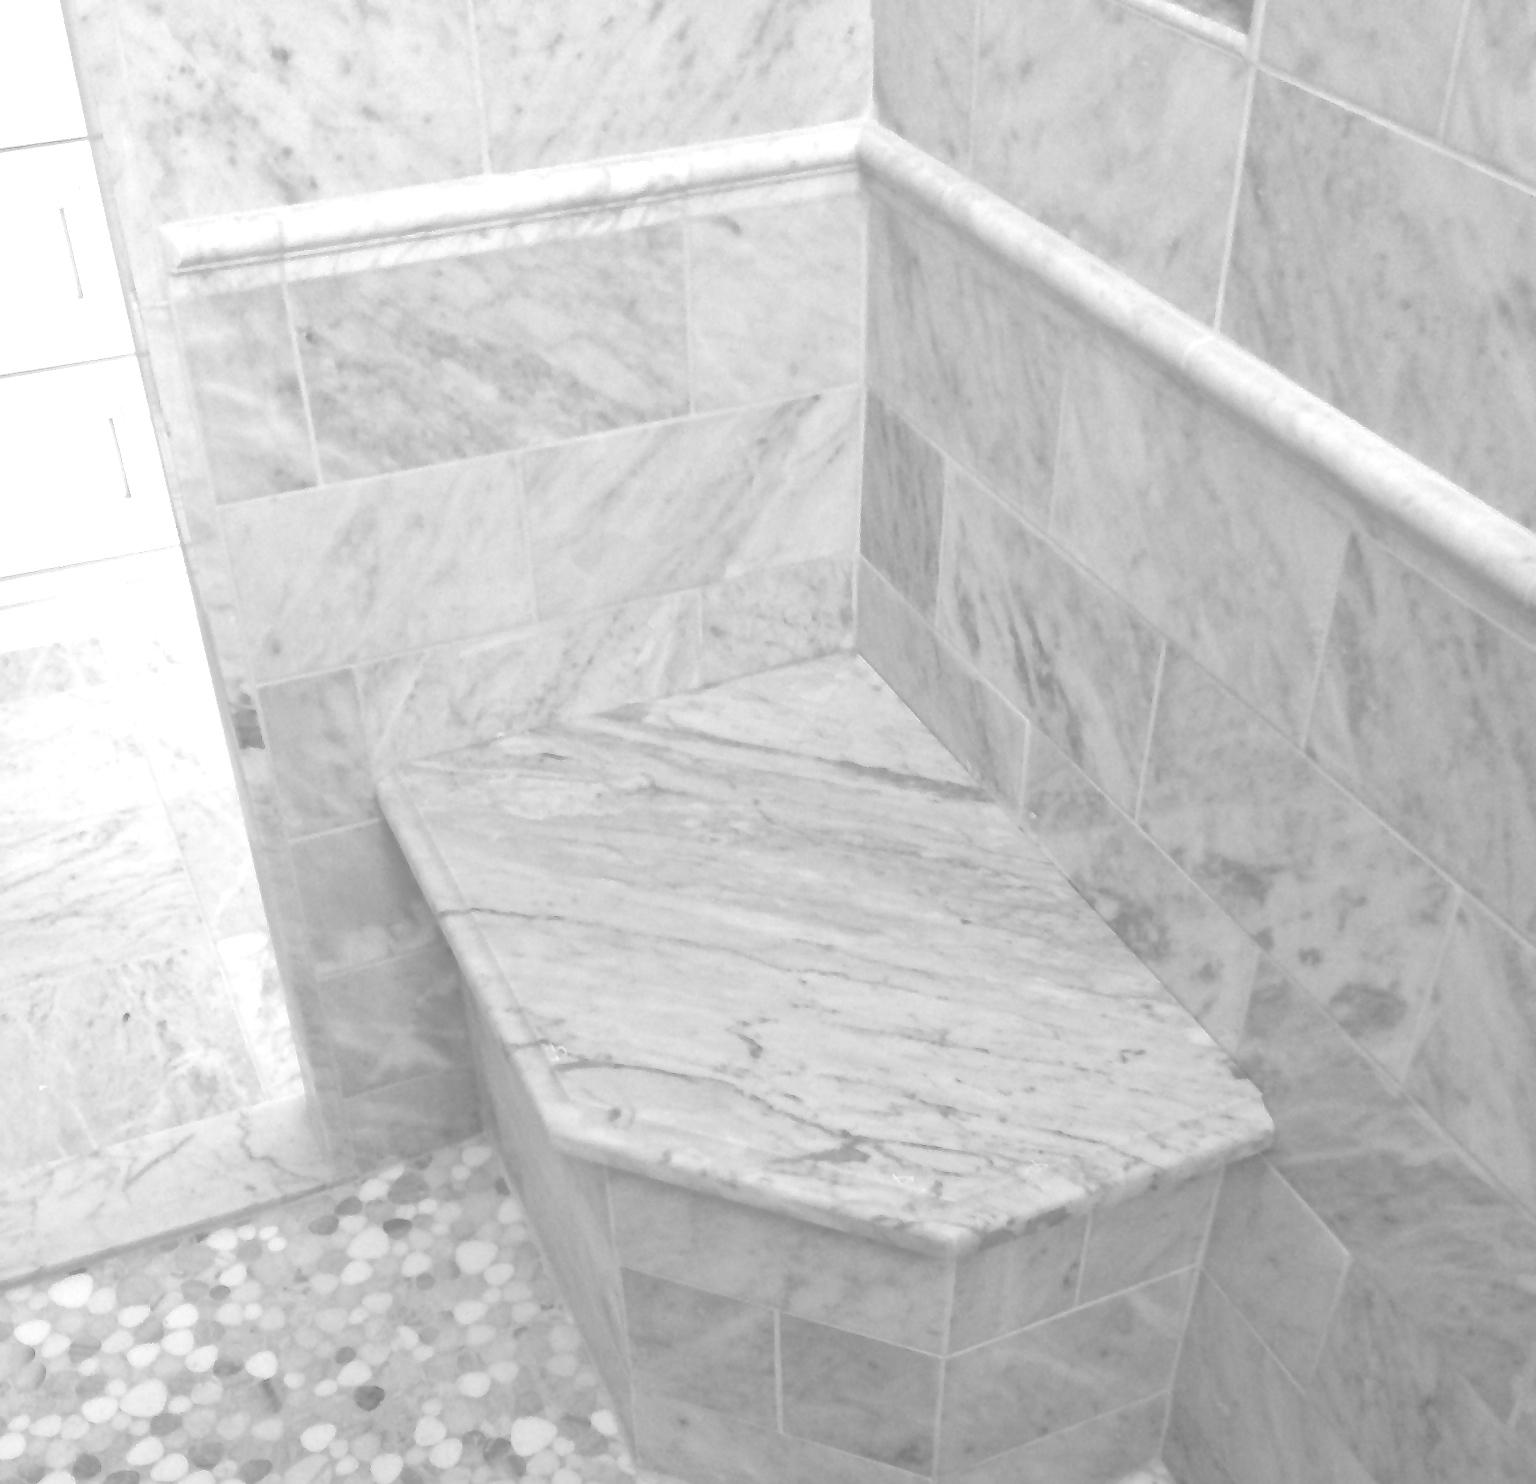 sower walls/bathroom remodeling